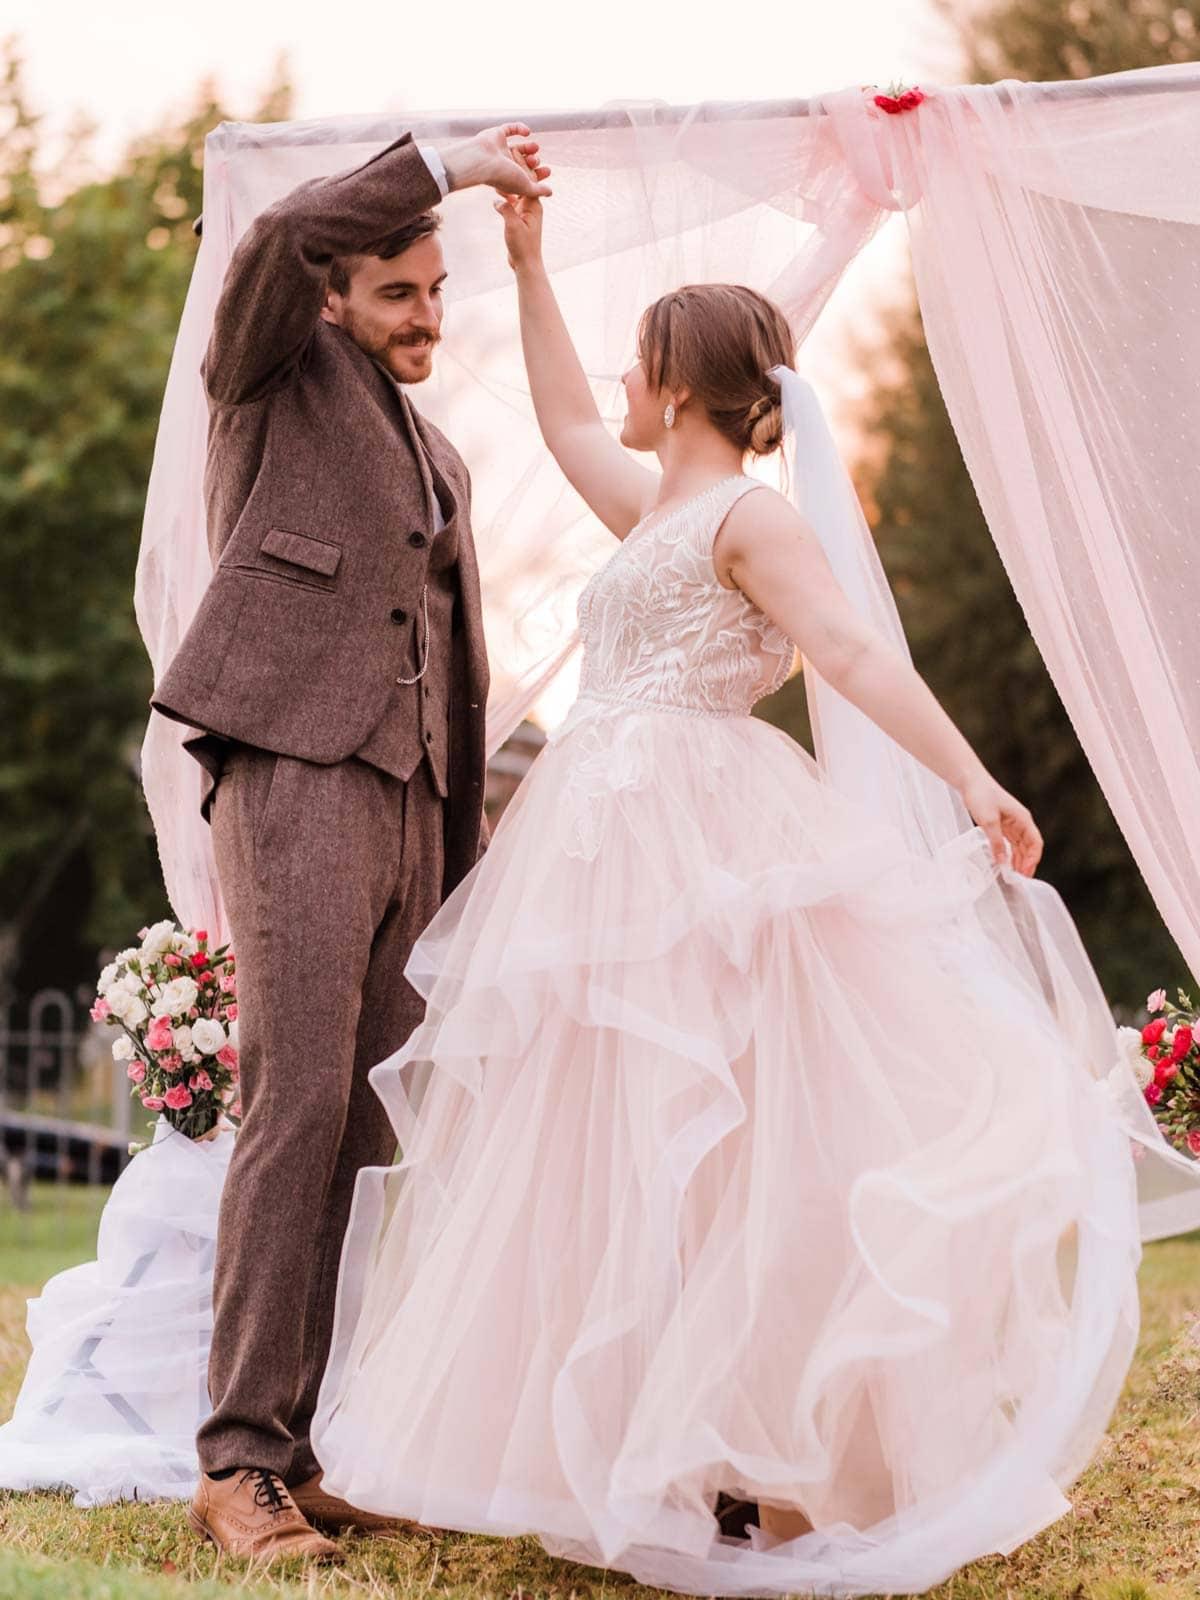 Outdoor wedding photoshoot, bride and groom first dance, Birmingham Wedding photographer